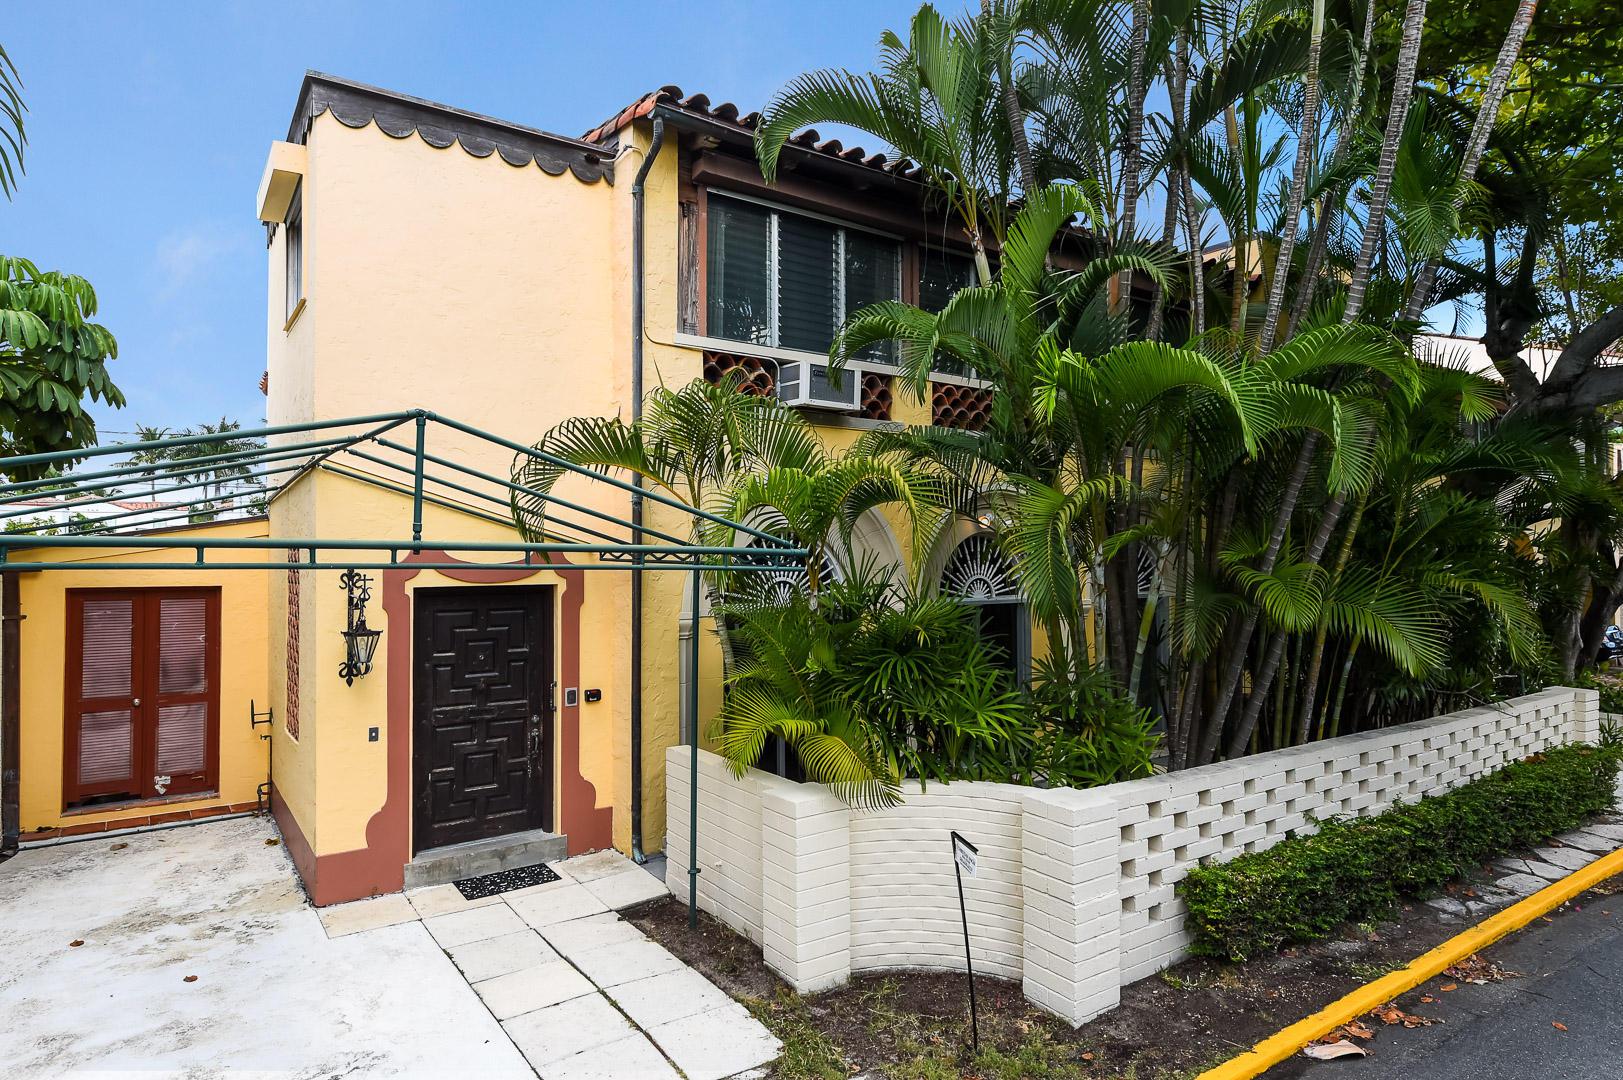 206 Phipps  Palm Beach FL 33480